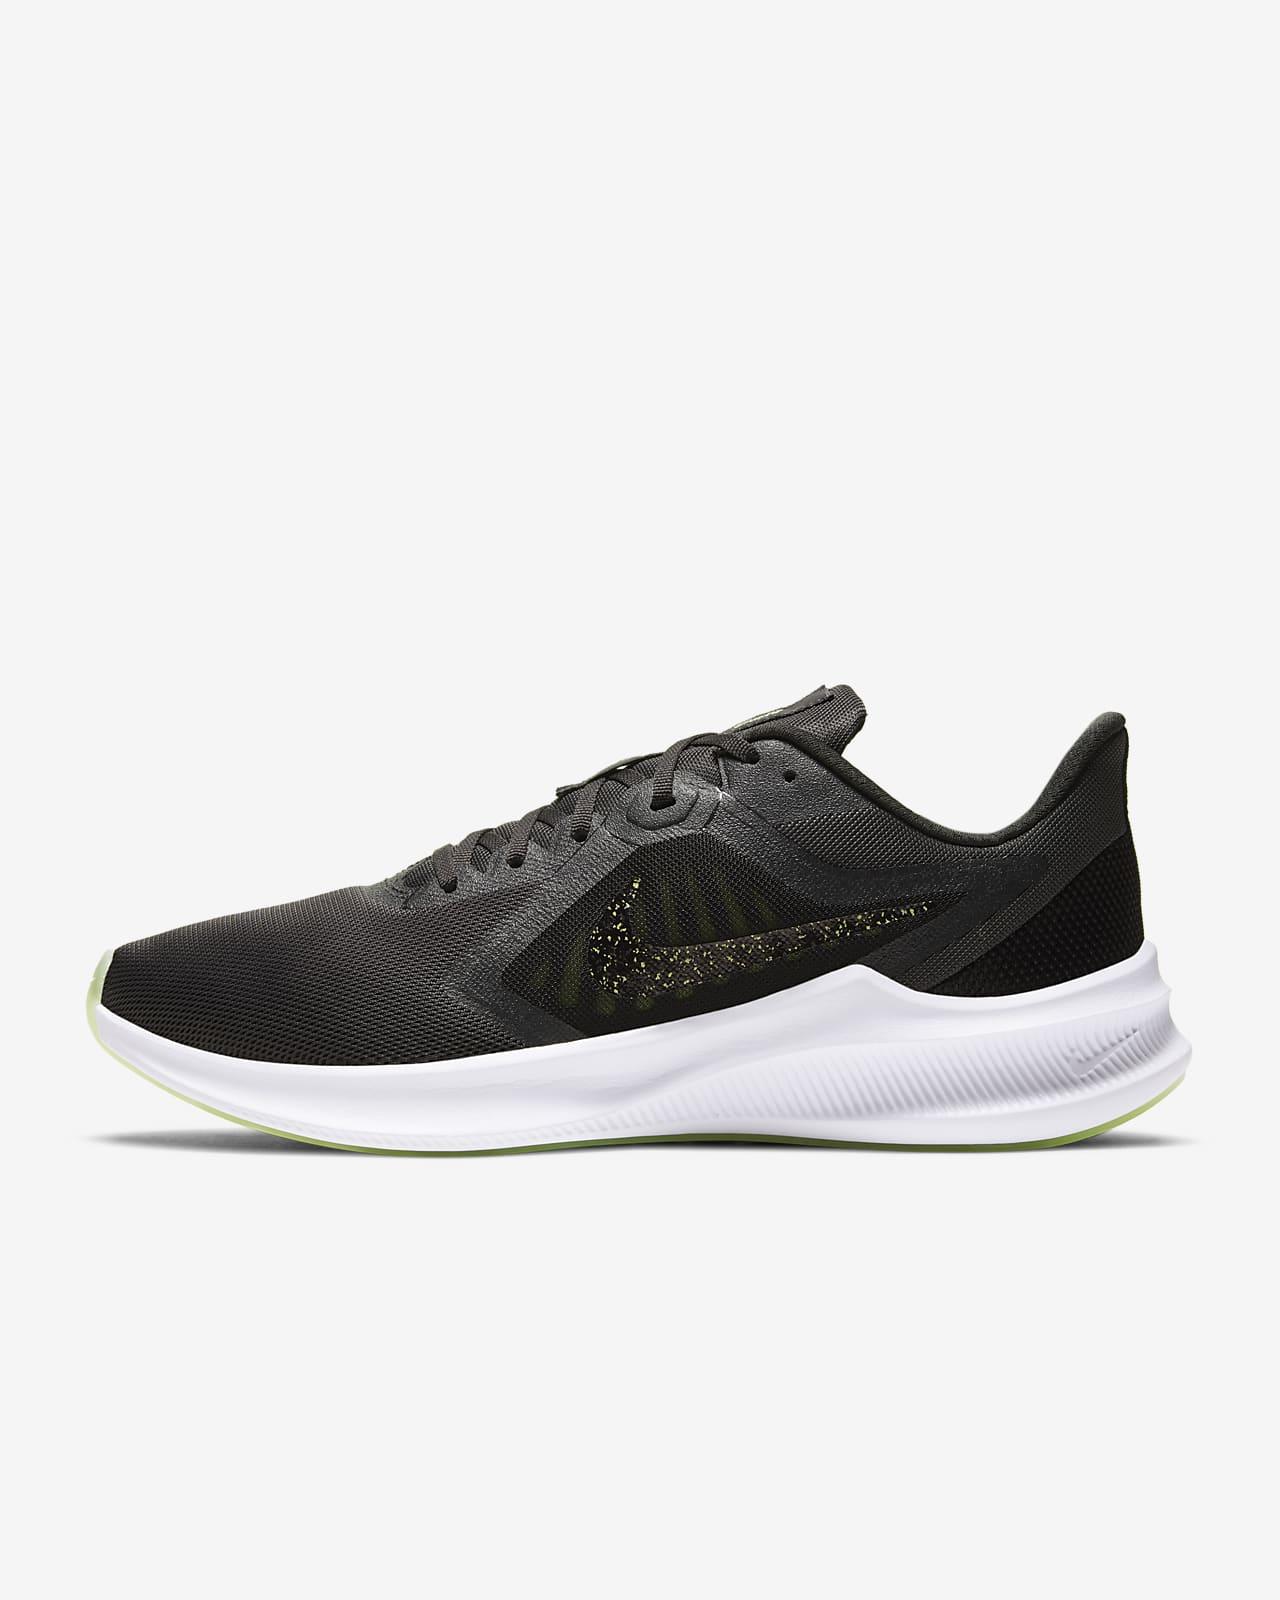 Nike Downshifter 10 Special Edition Herren-Laufschuh